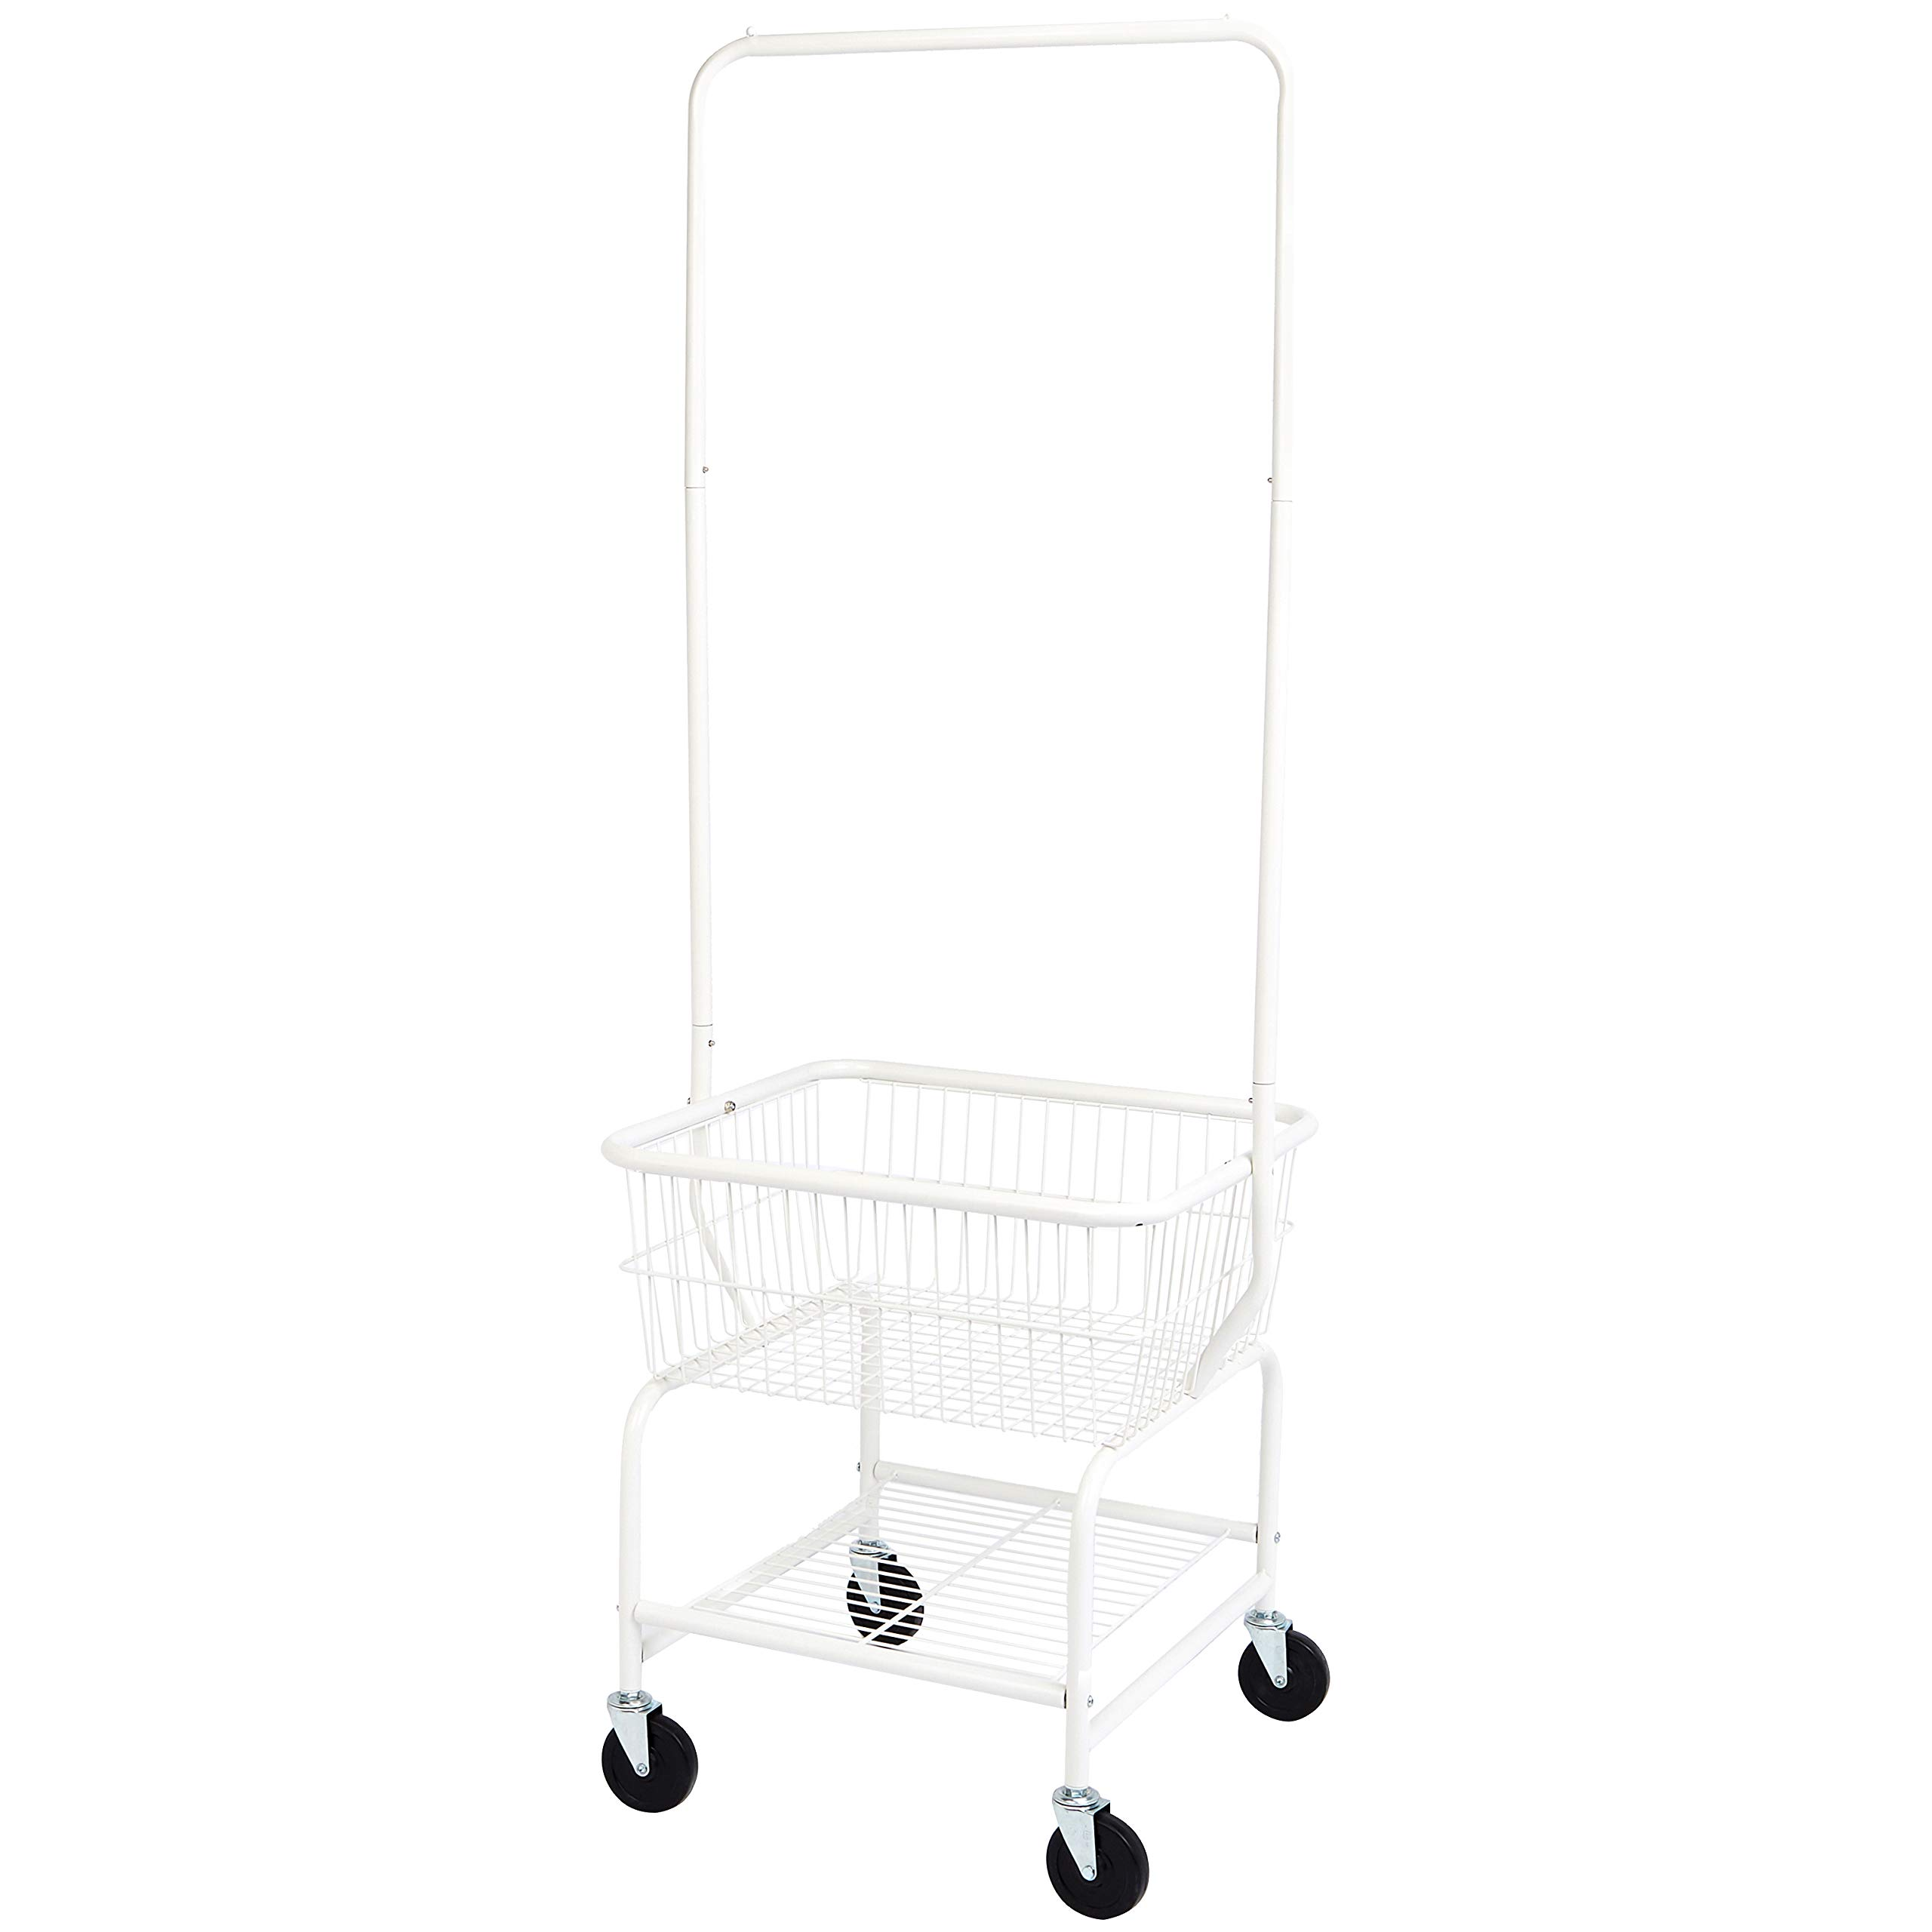 AmazonBasics Laundry Butler with Wheels